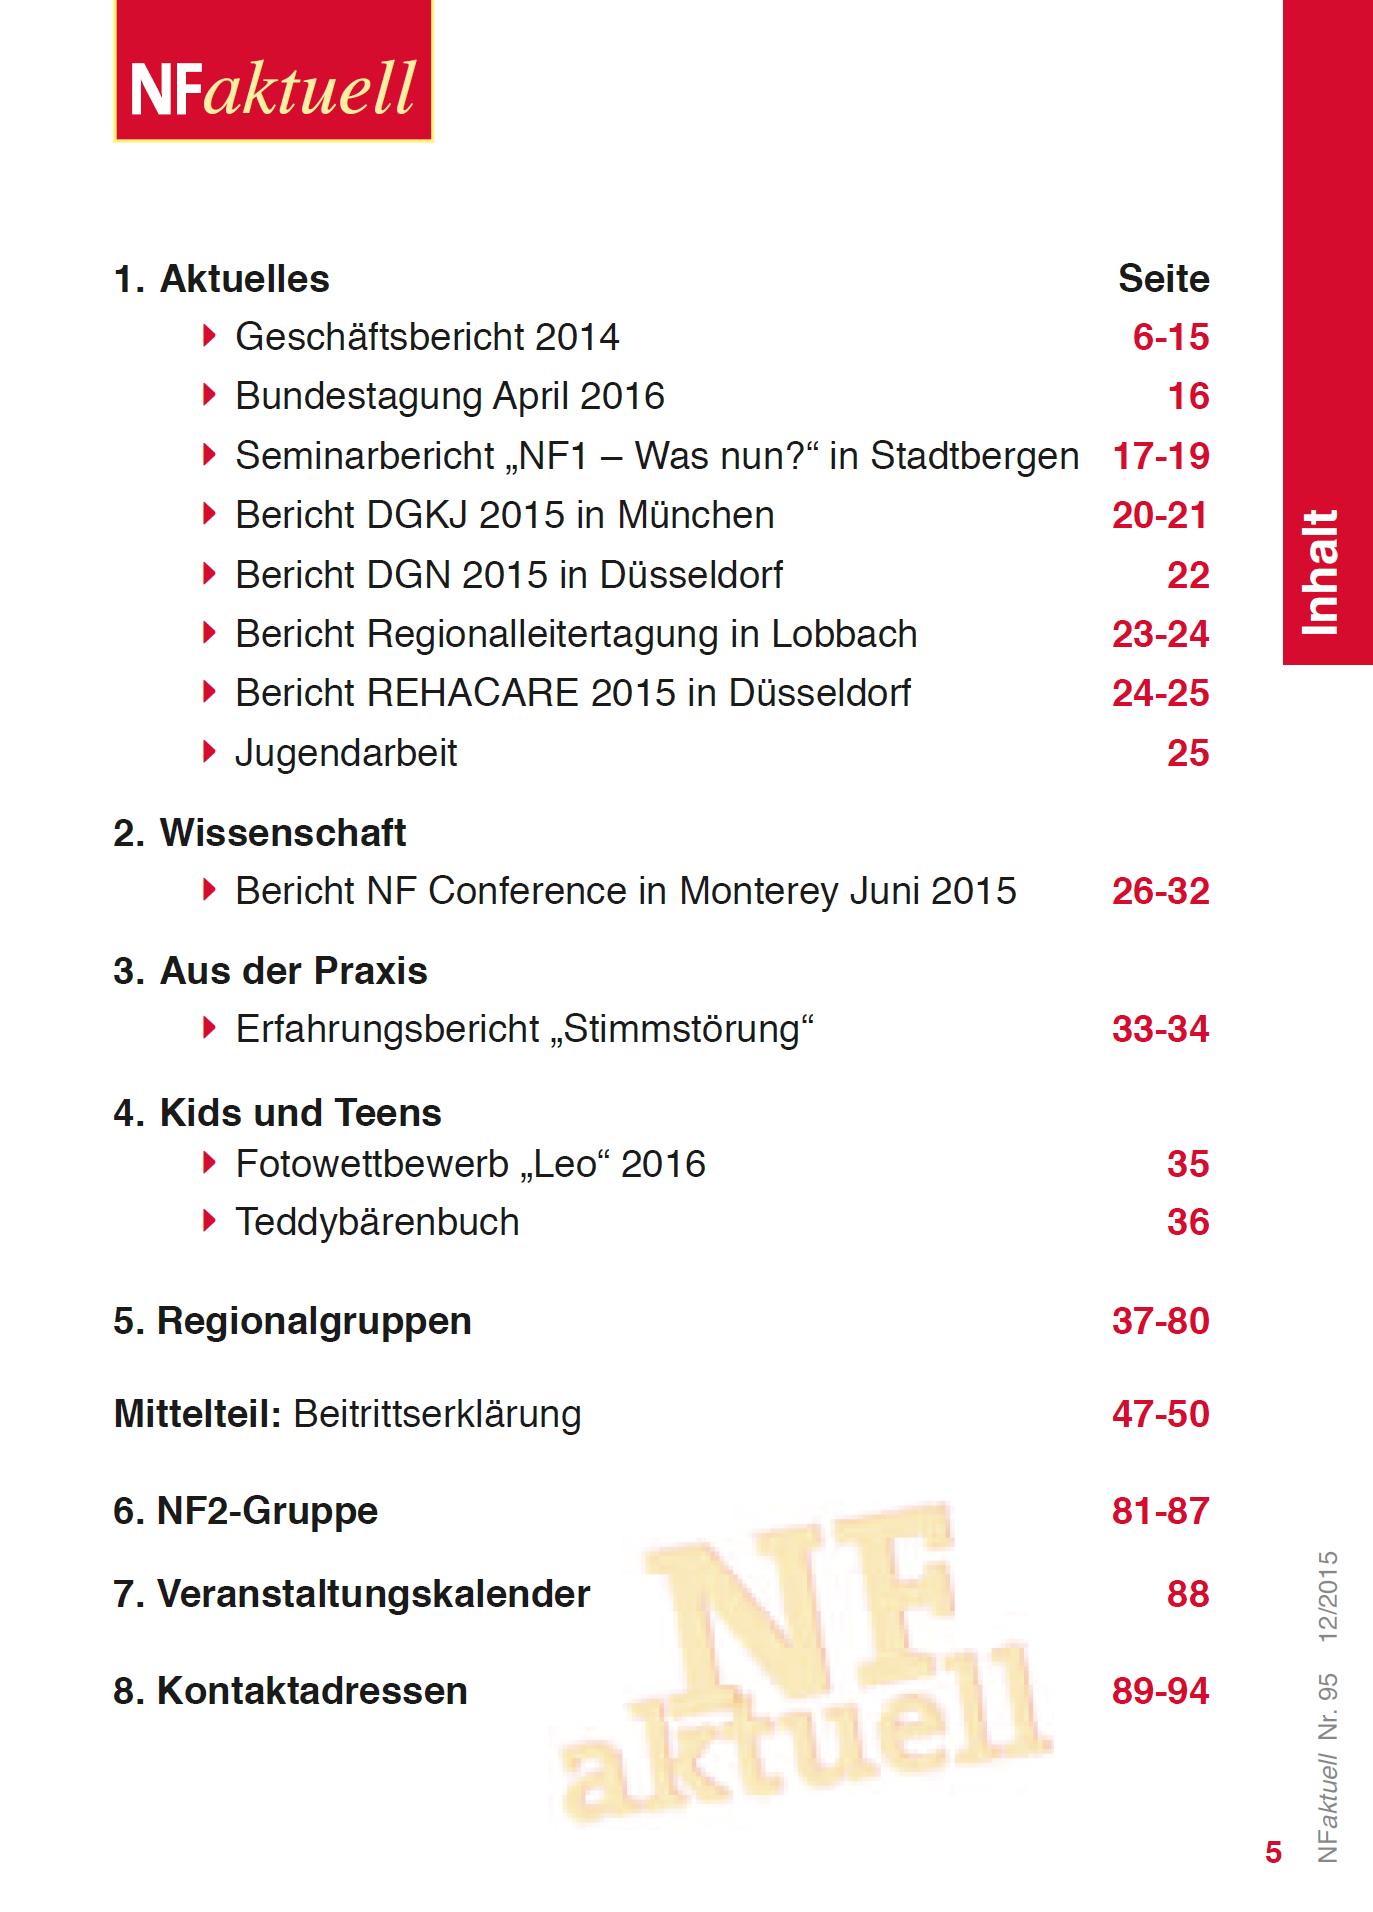 NFaktuell-95-dezember-2015-inhalt